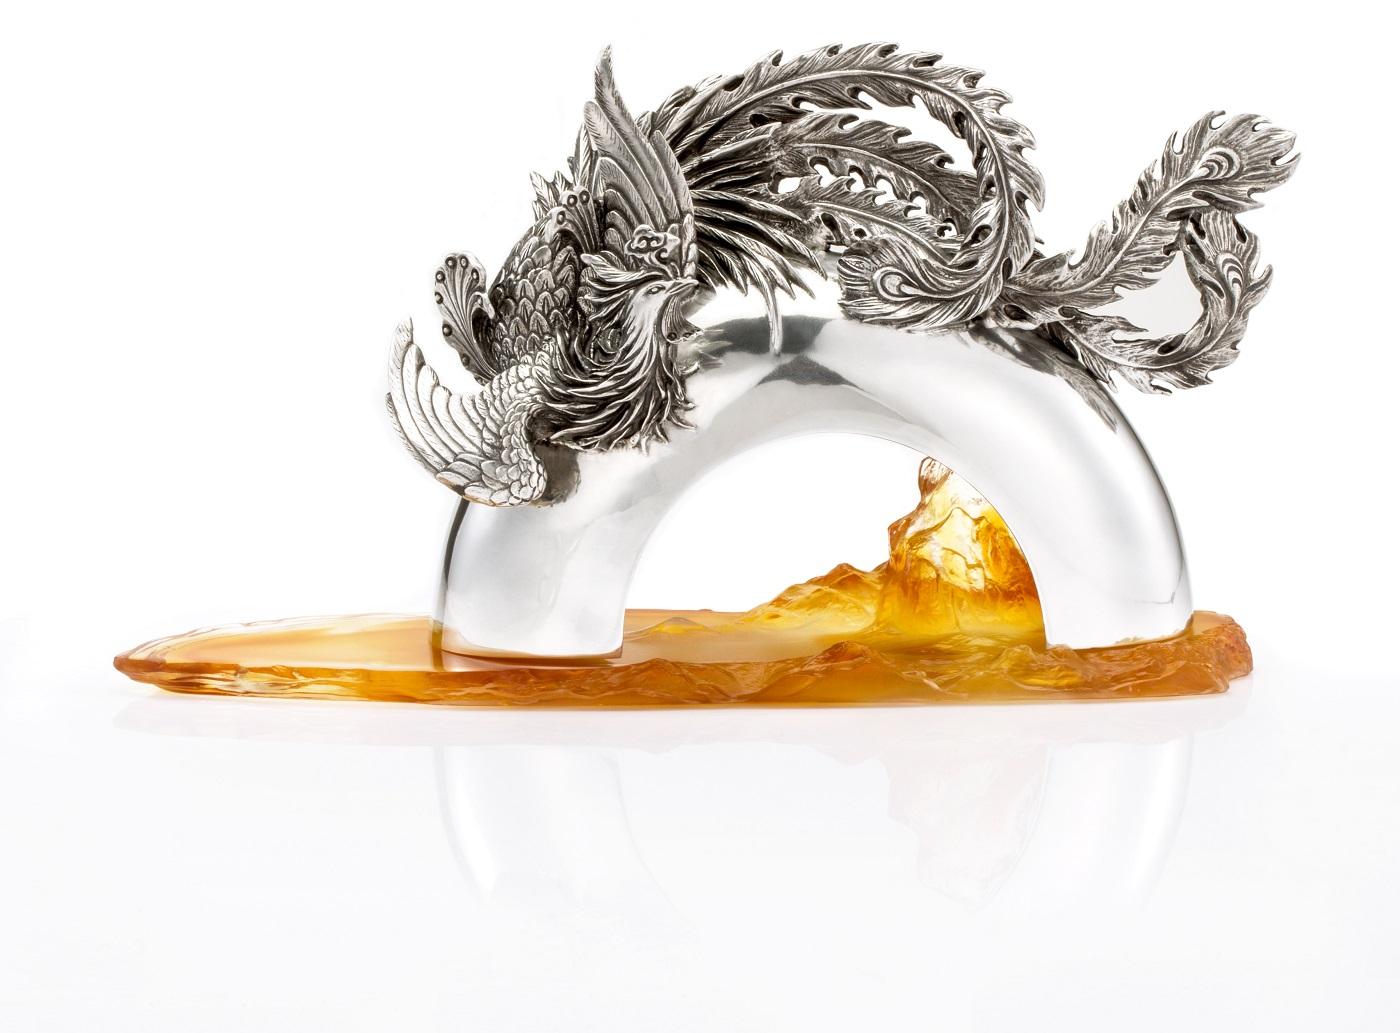 pewter-phoenix-figurine-on-glass-base_2reduced2